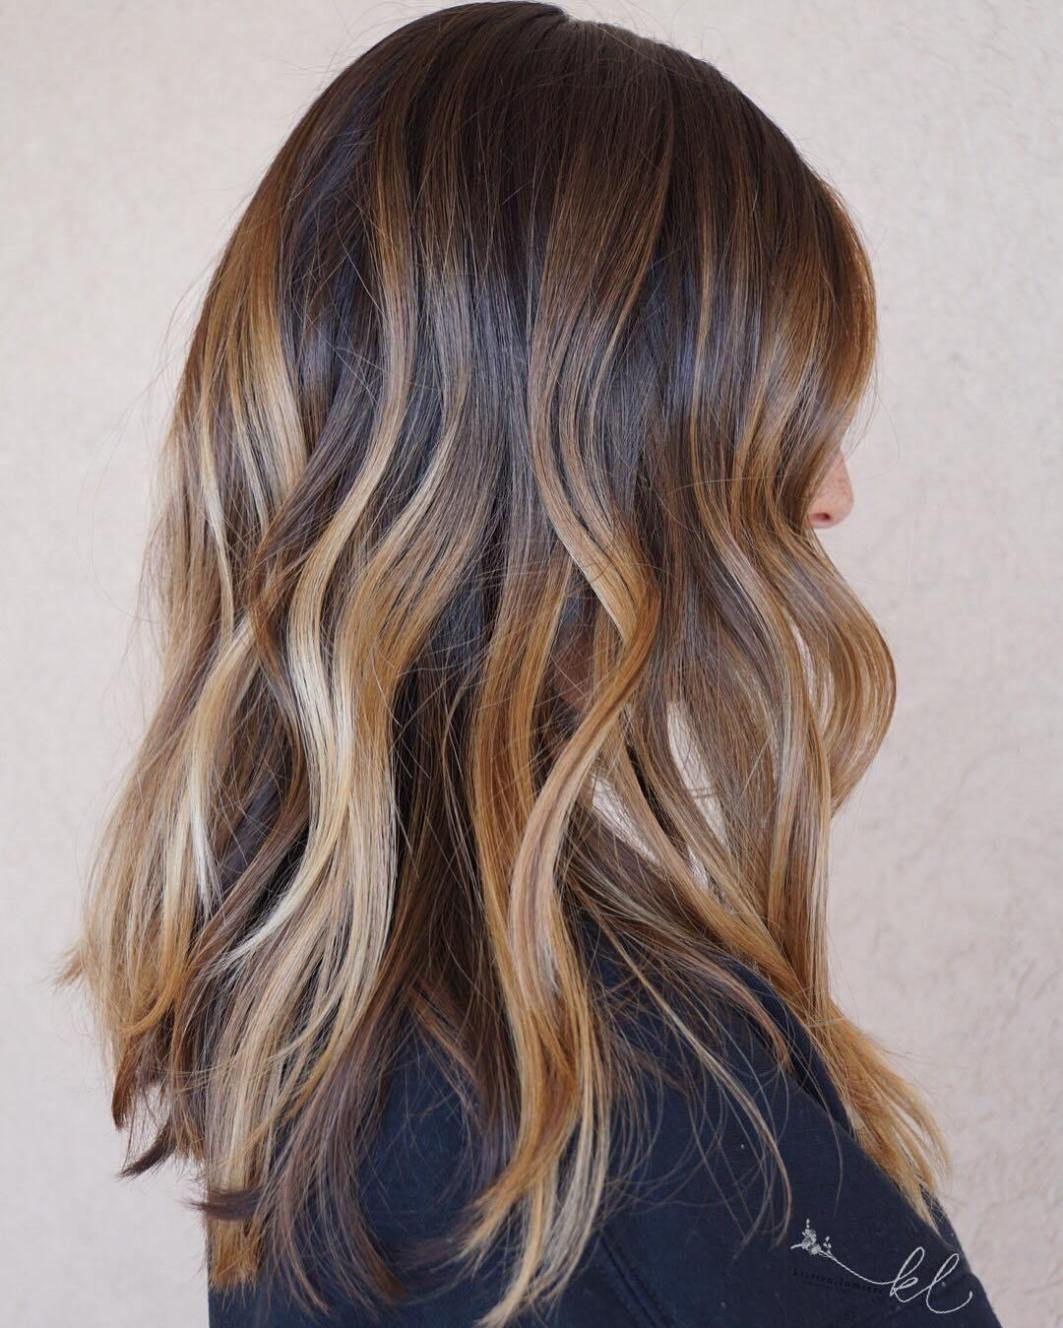 70 Flattering Balayage Hair Color Ideas for 2019 #caramelbalayage